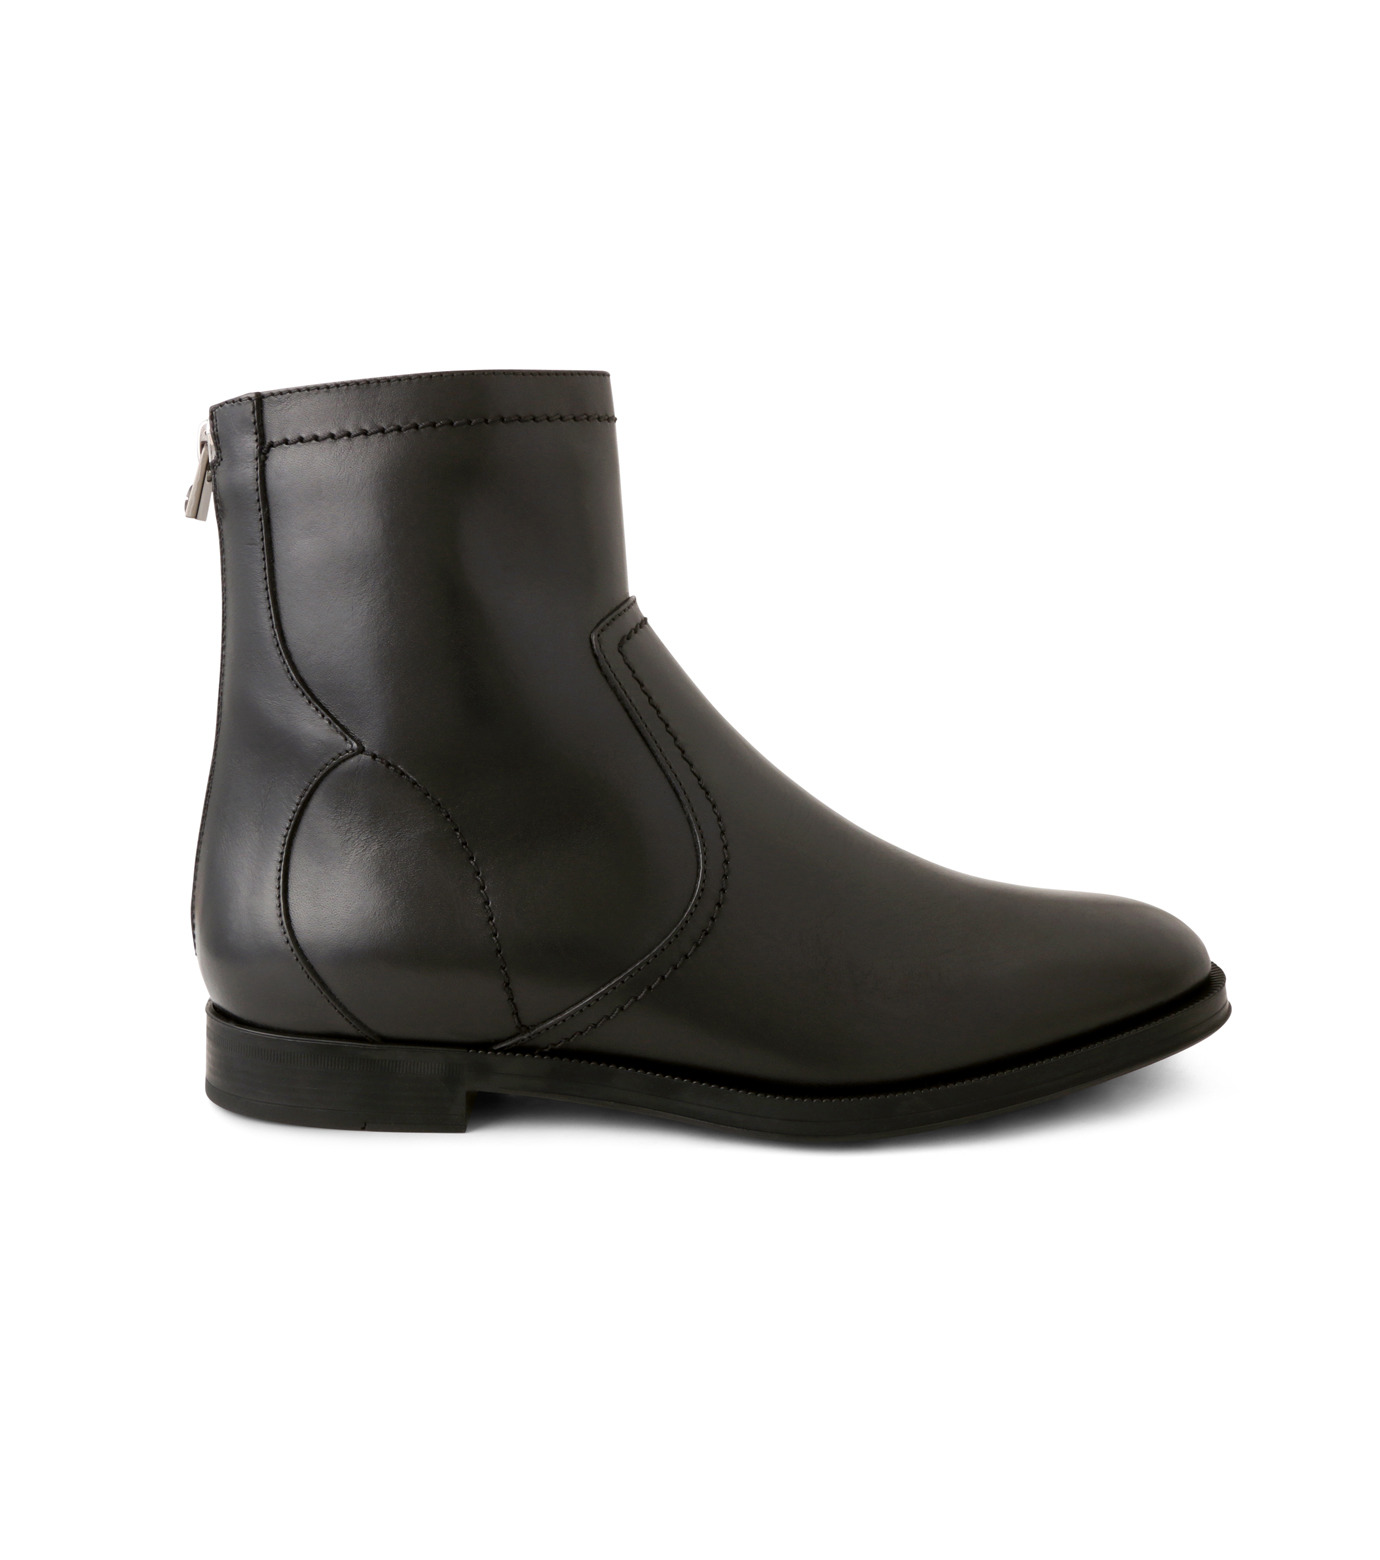 Jimmy Choo(ジミーチュウ)のMouton Boots-BLACK(ブーツ/boots)-PABLO-SVS-13 拡大詳細画像1